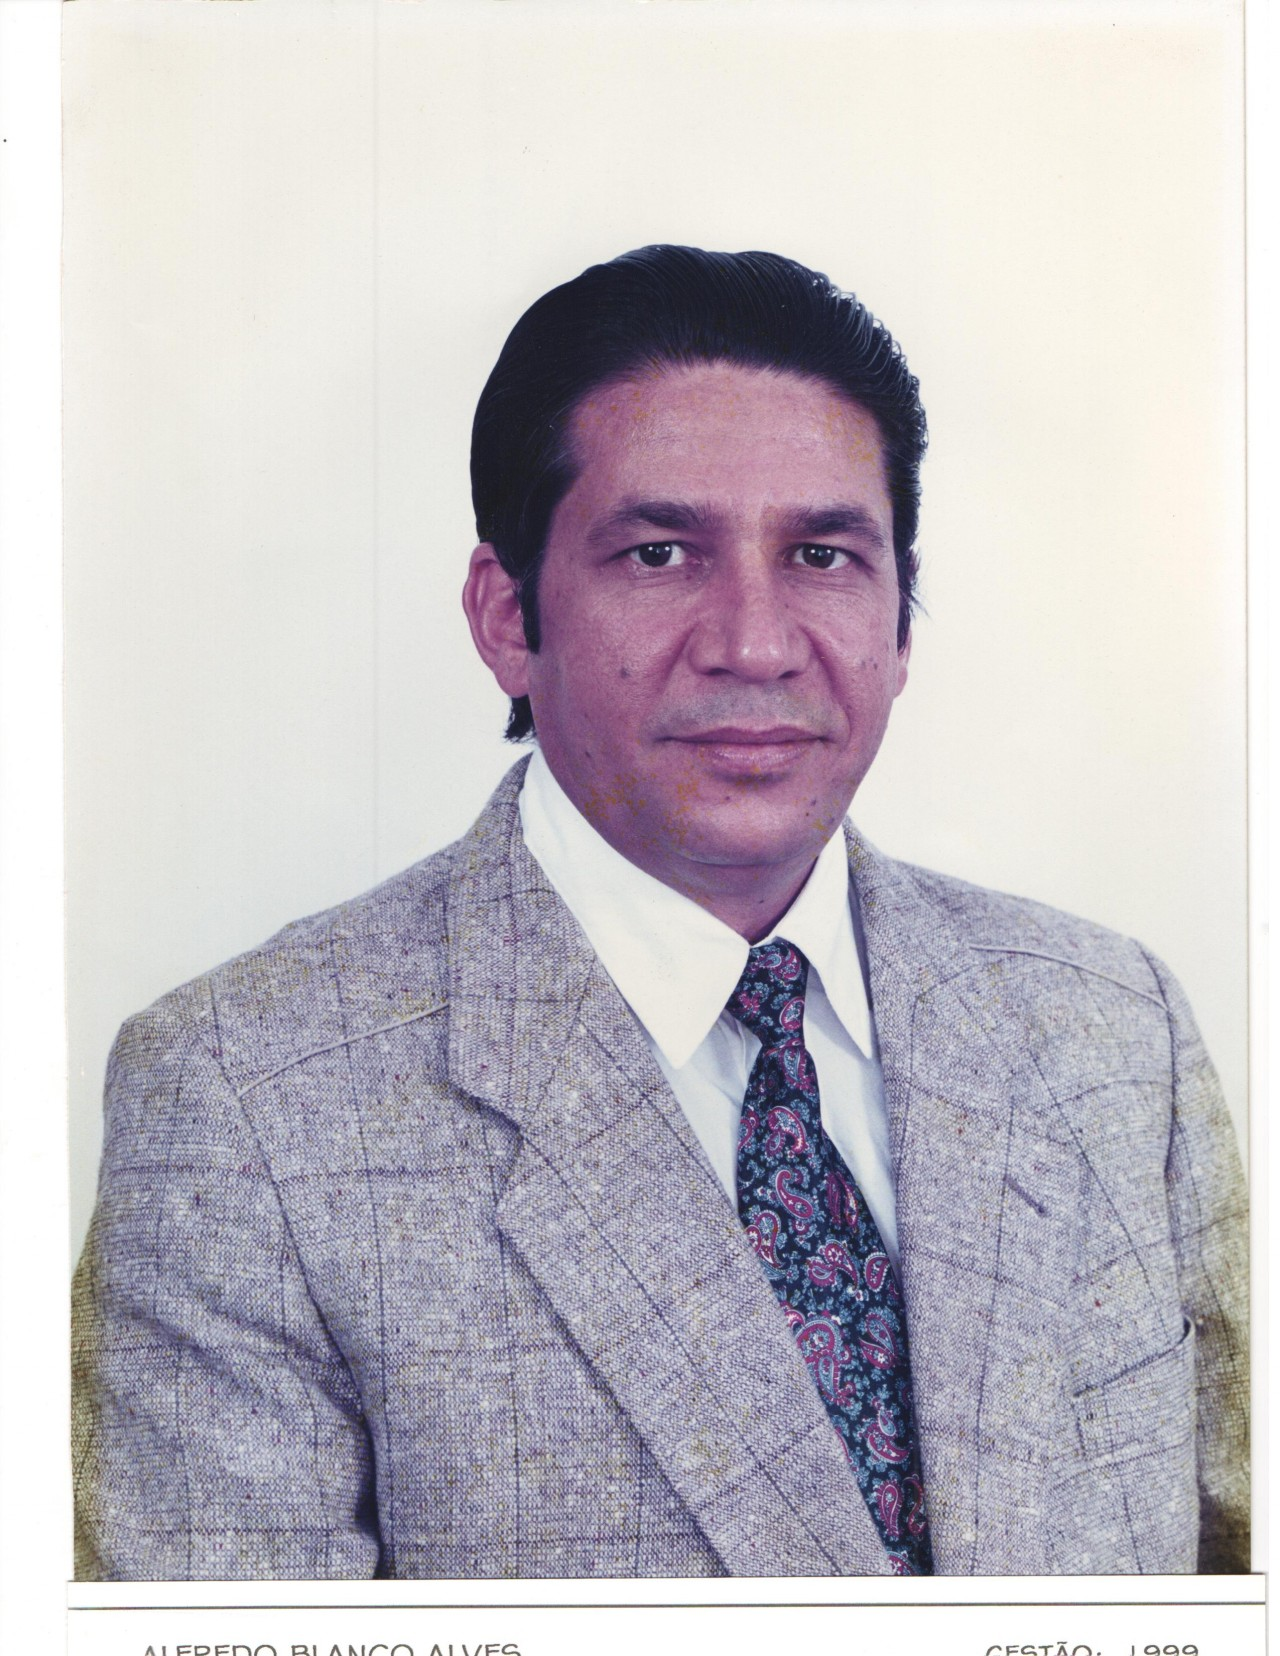 ALFREDO BLANCO ALVES